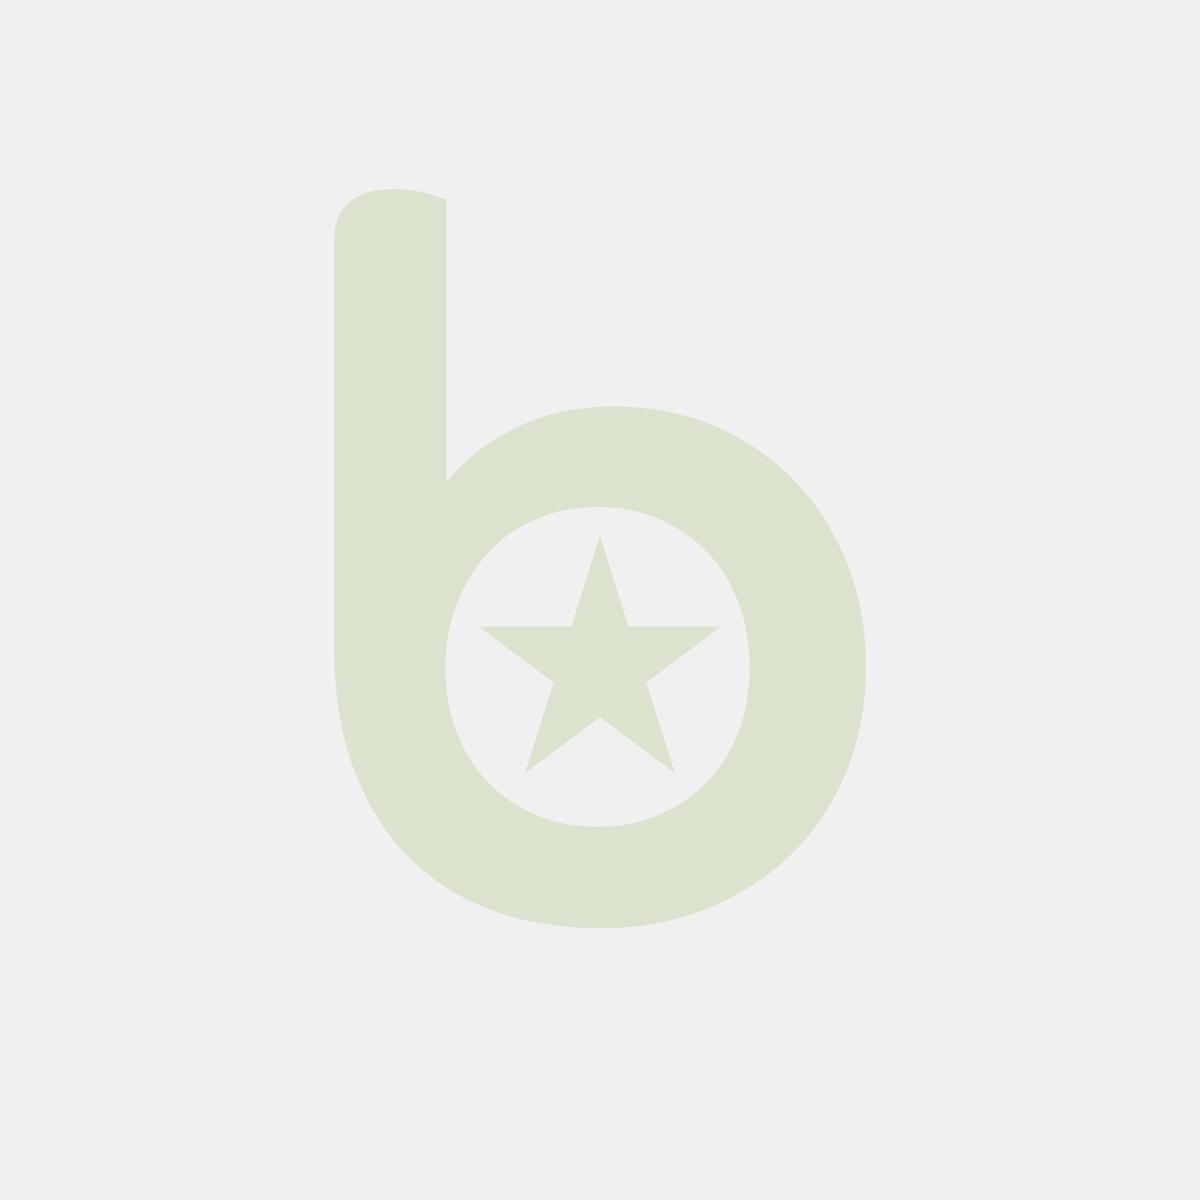 Serwetki 33x33 2W 1/4 BaVillo naturel jasny brąz eko op. 250 sztuk